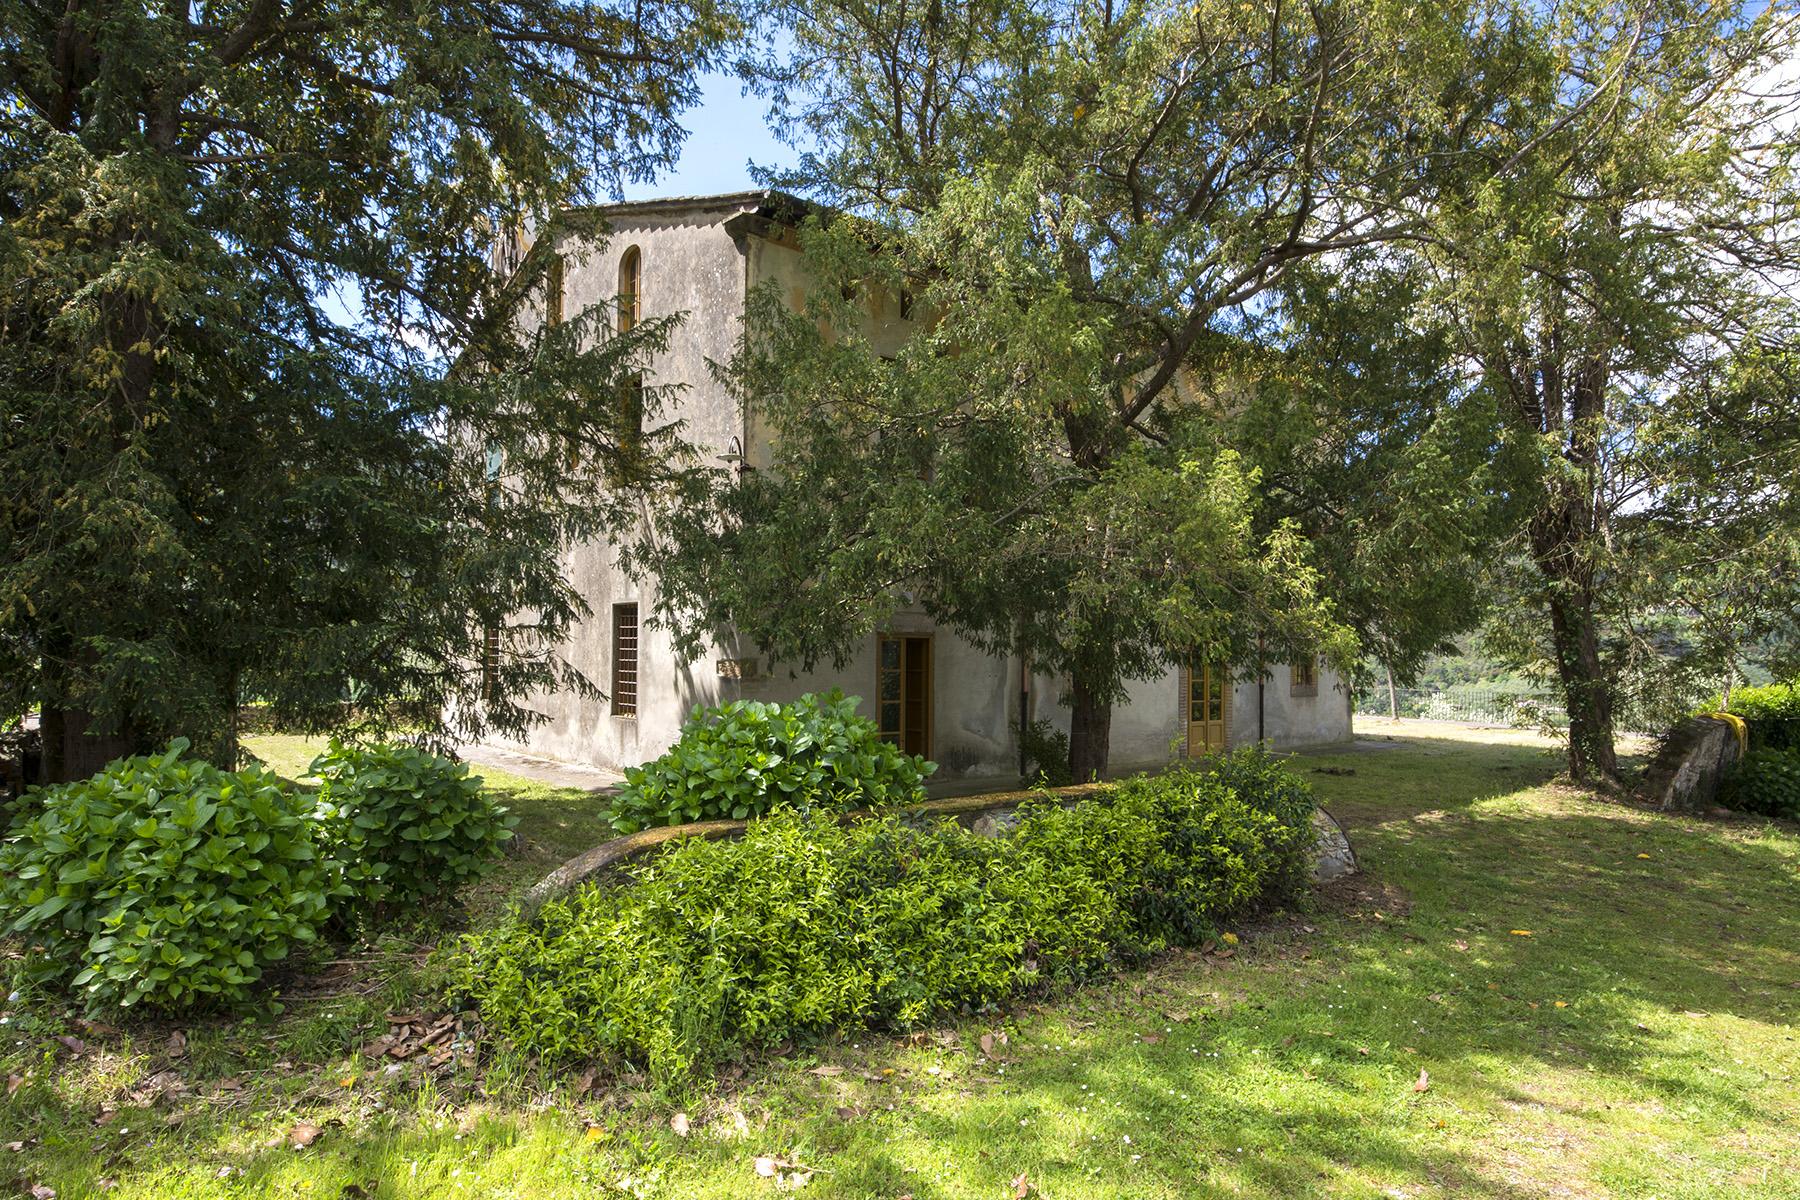 Villa in Vendita a Capannori: 5 locali, 490 mq - Foto 16